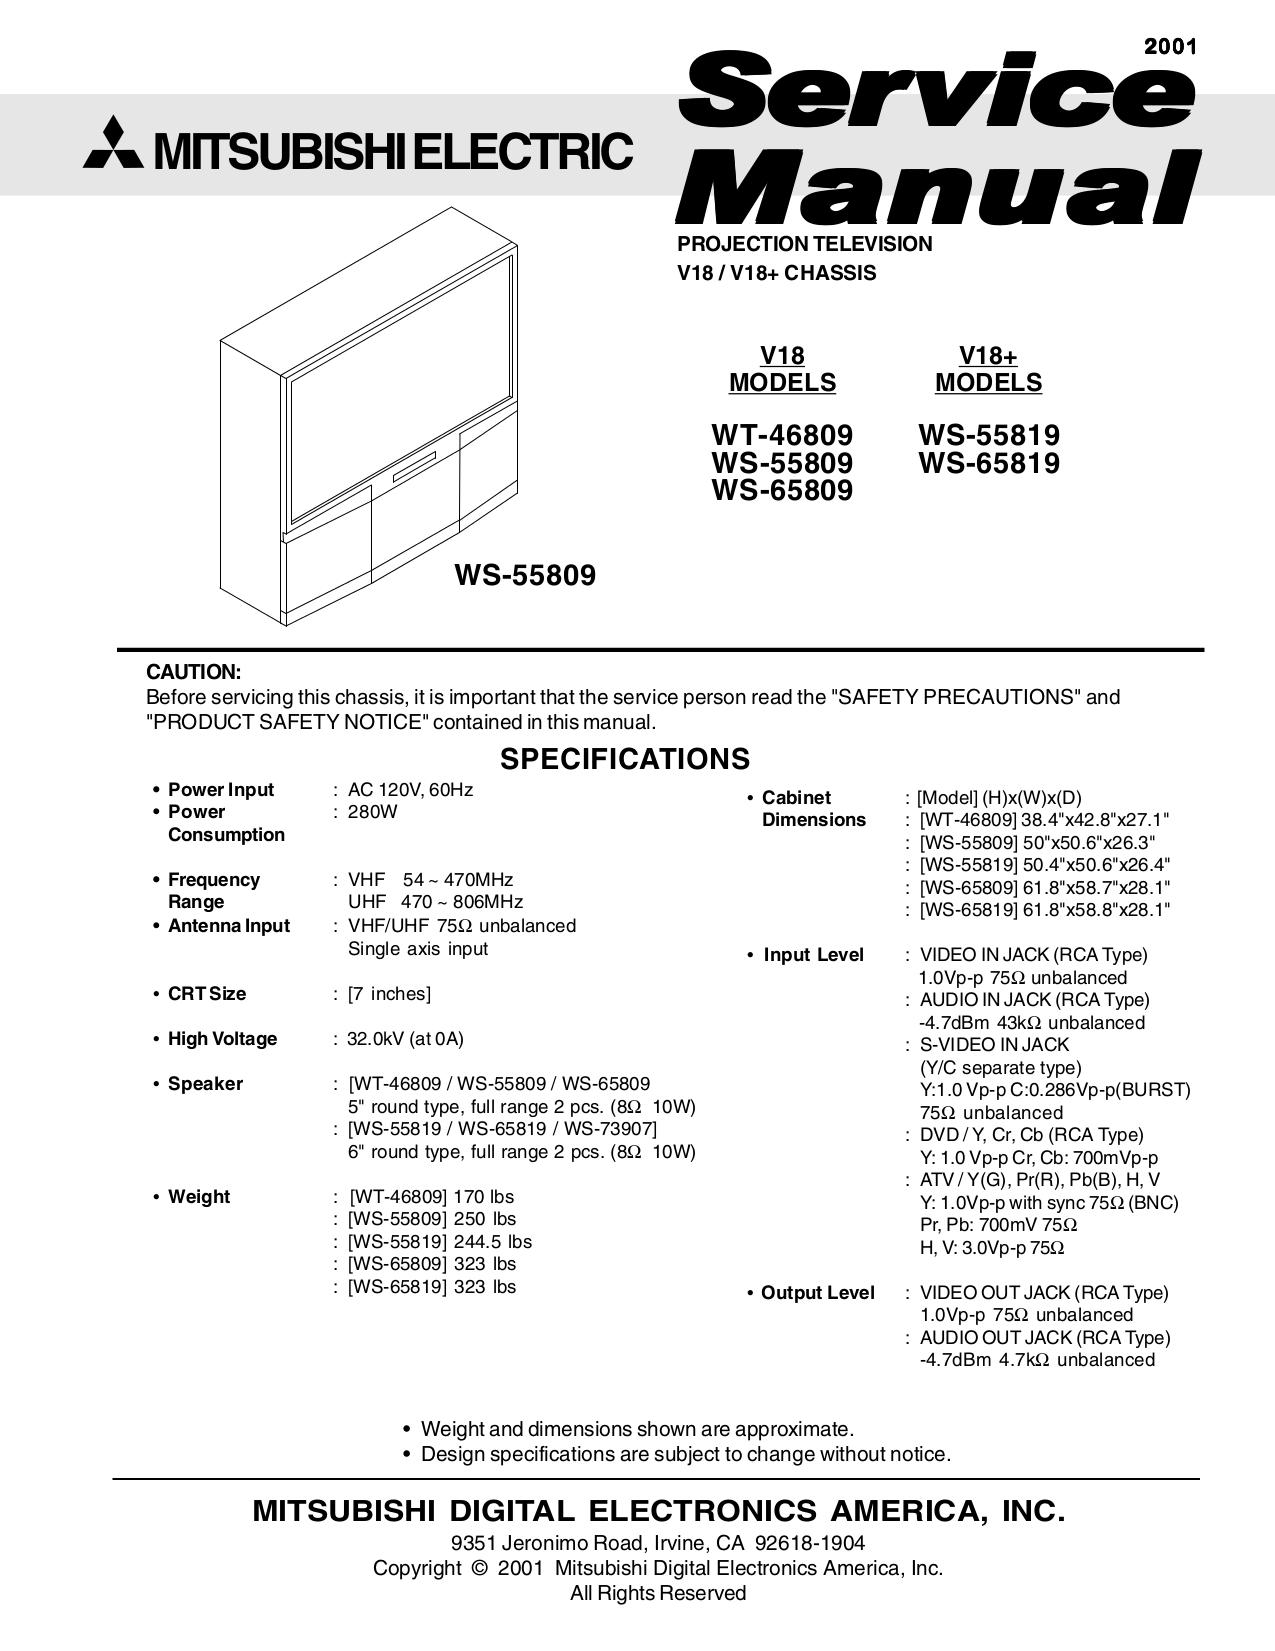 pdf for Mitsubishi TV WS-55819 manual